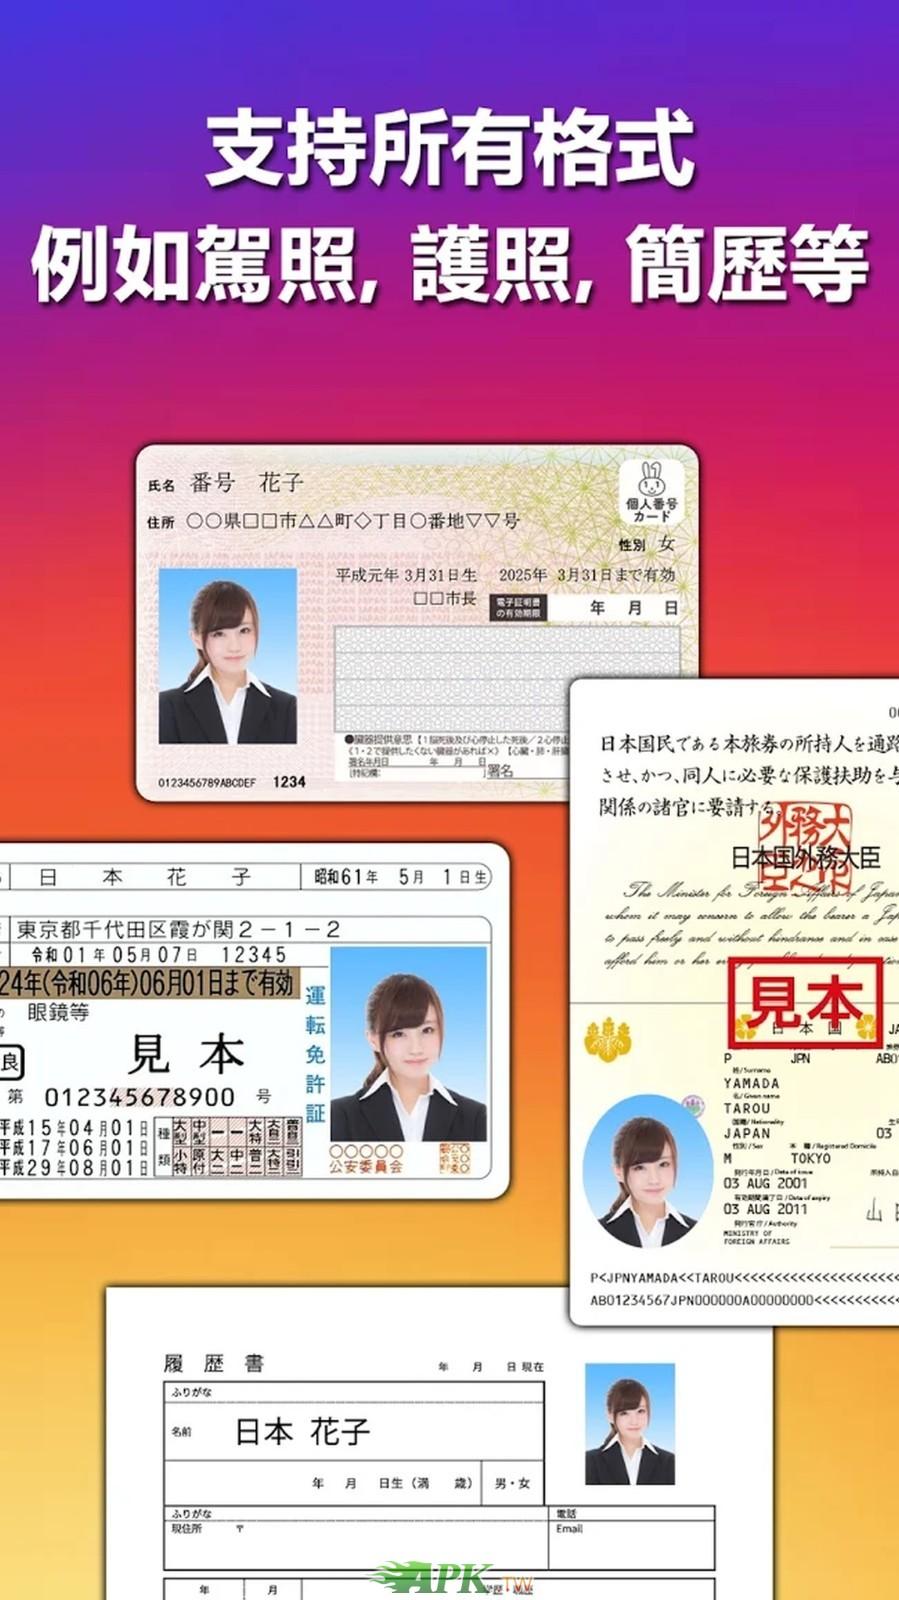 ID__2.jpg